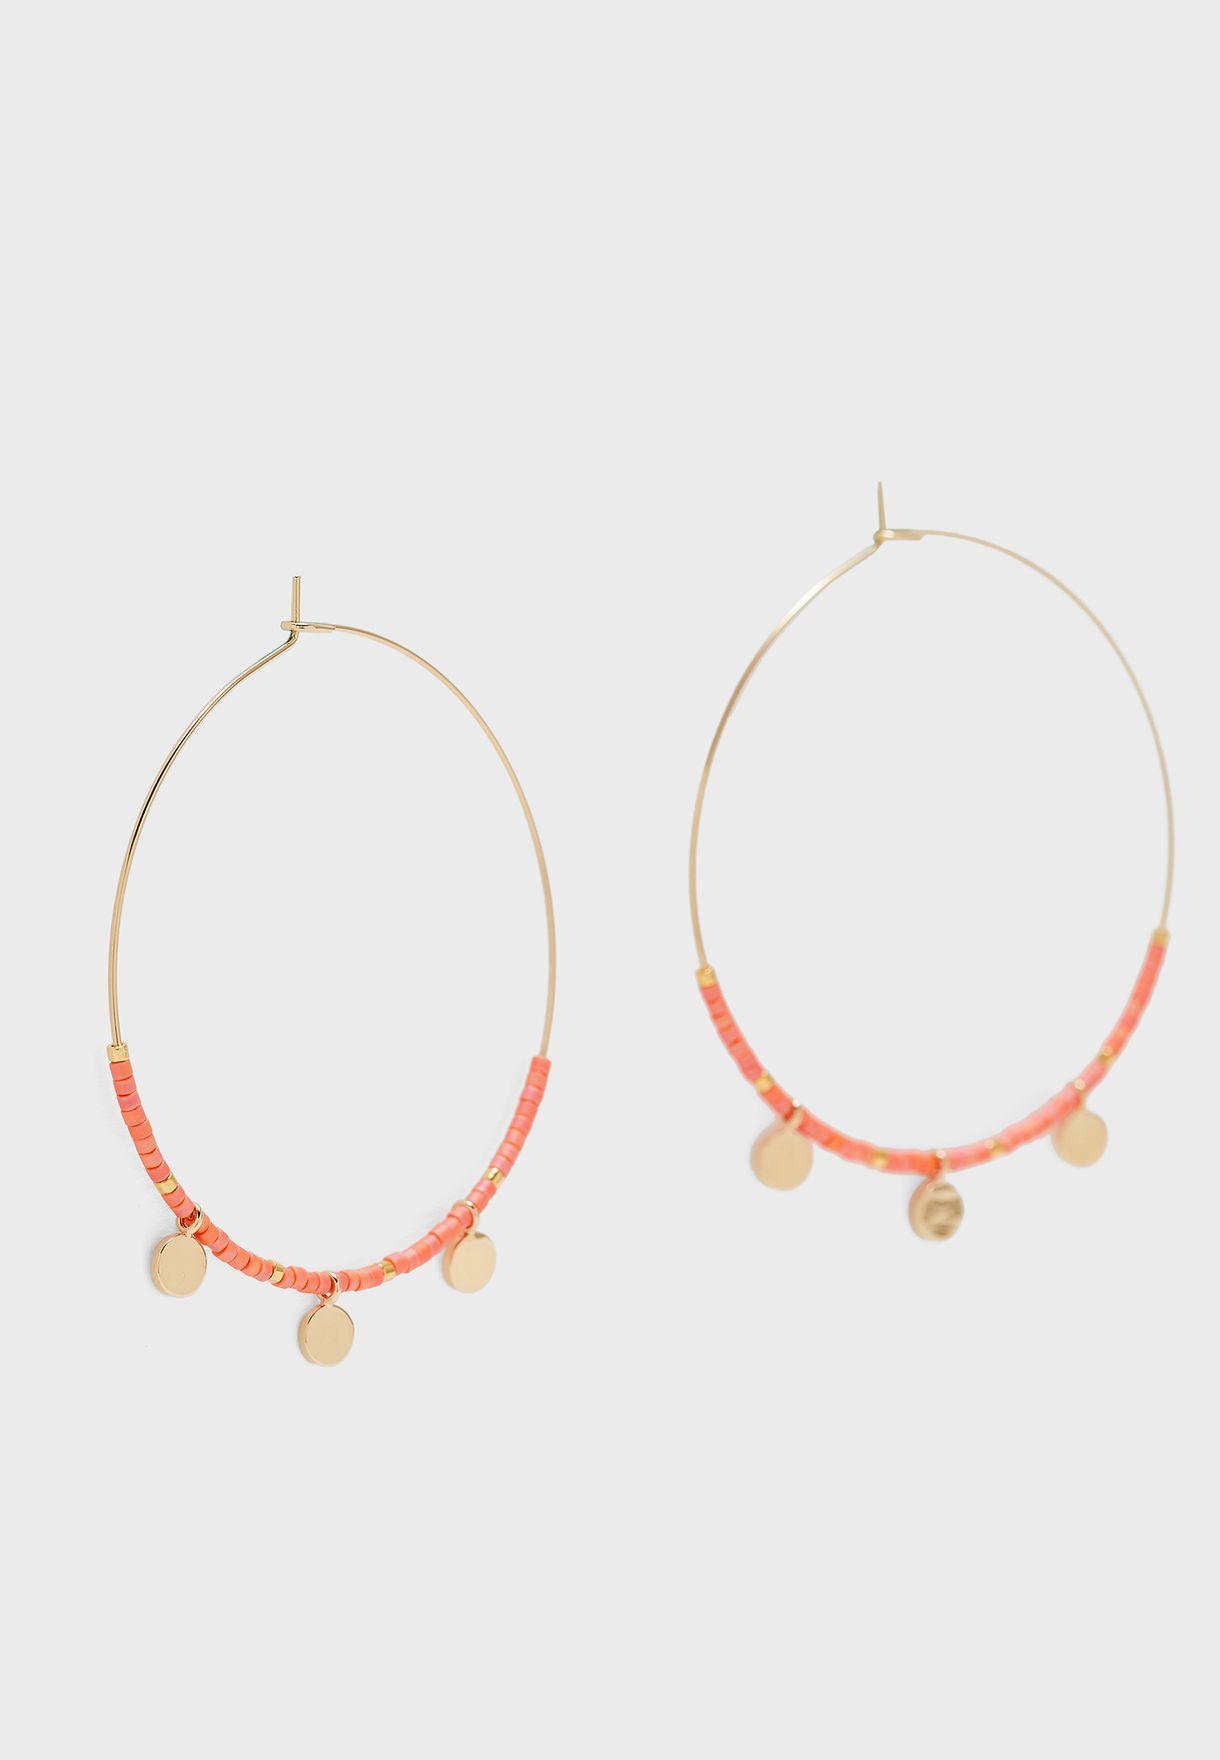 Coin Charm & Seedbead Hoops Earrings